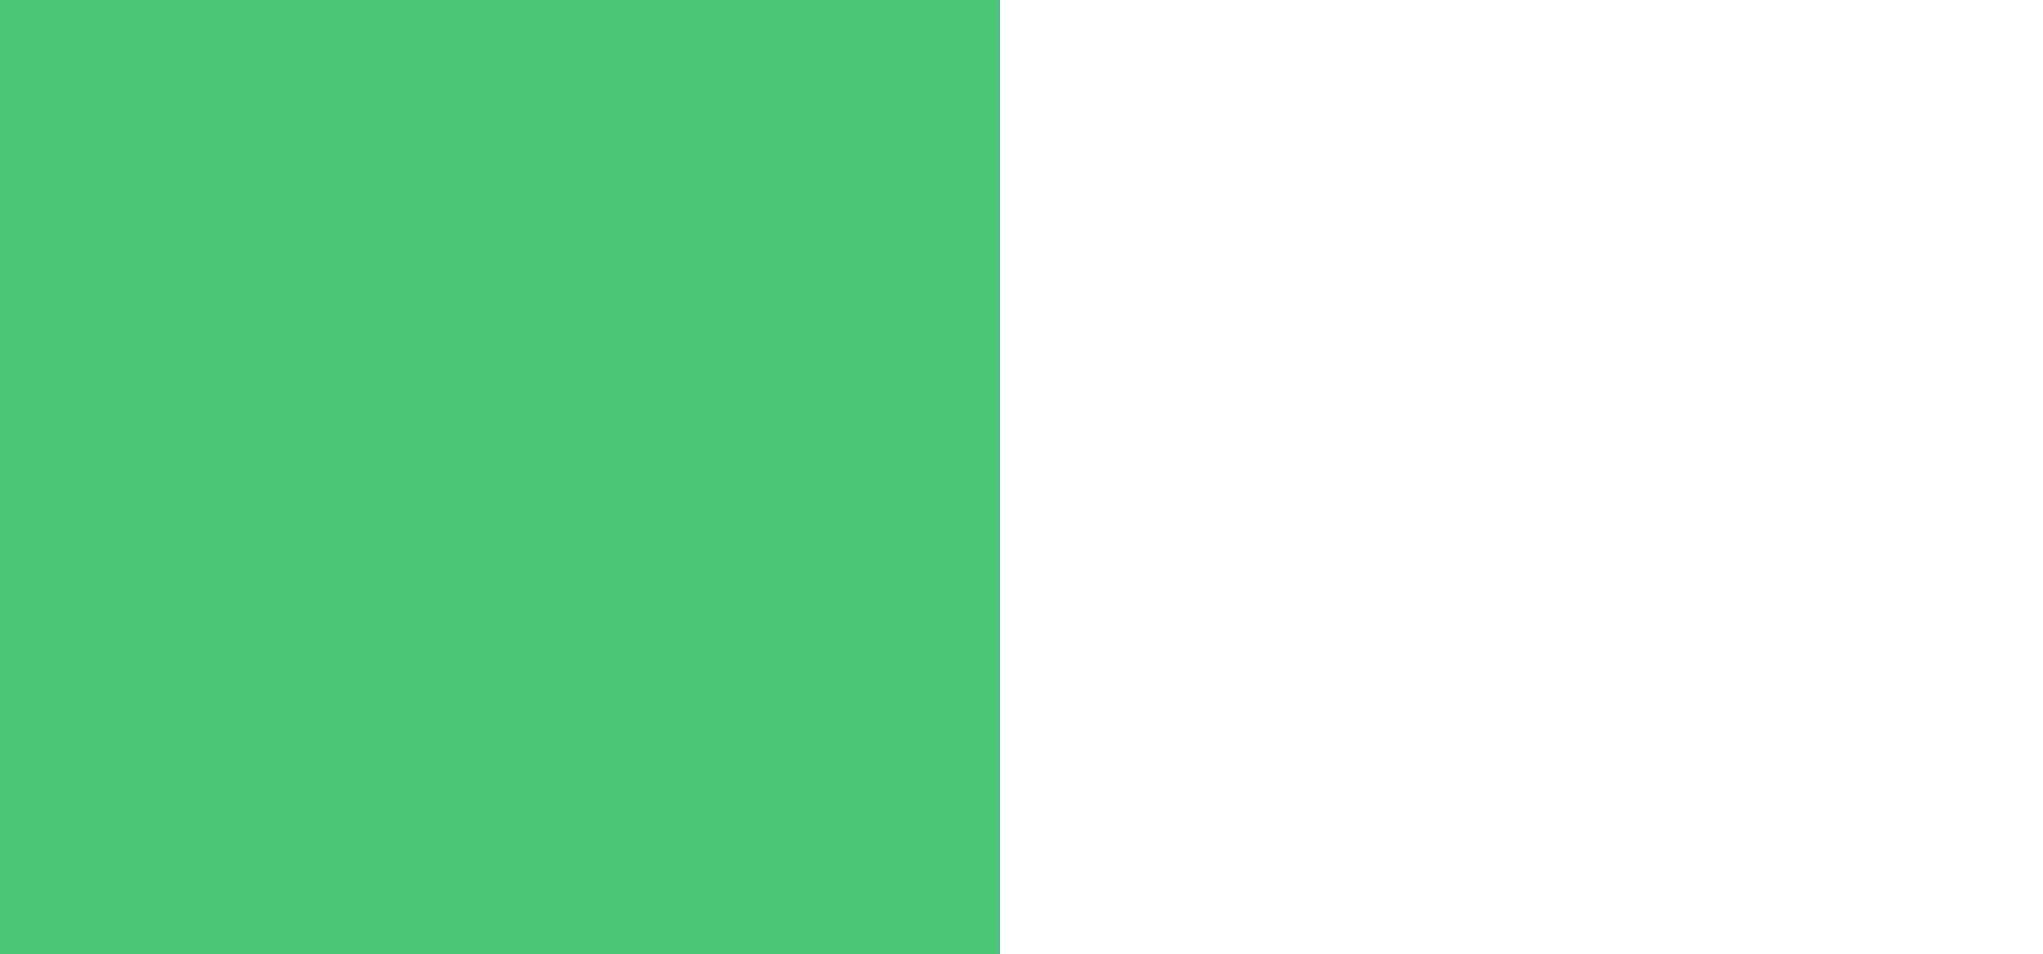 Vert / blanc